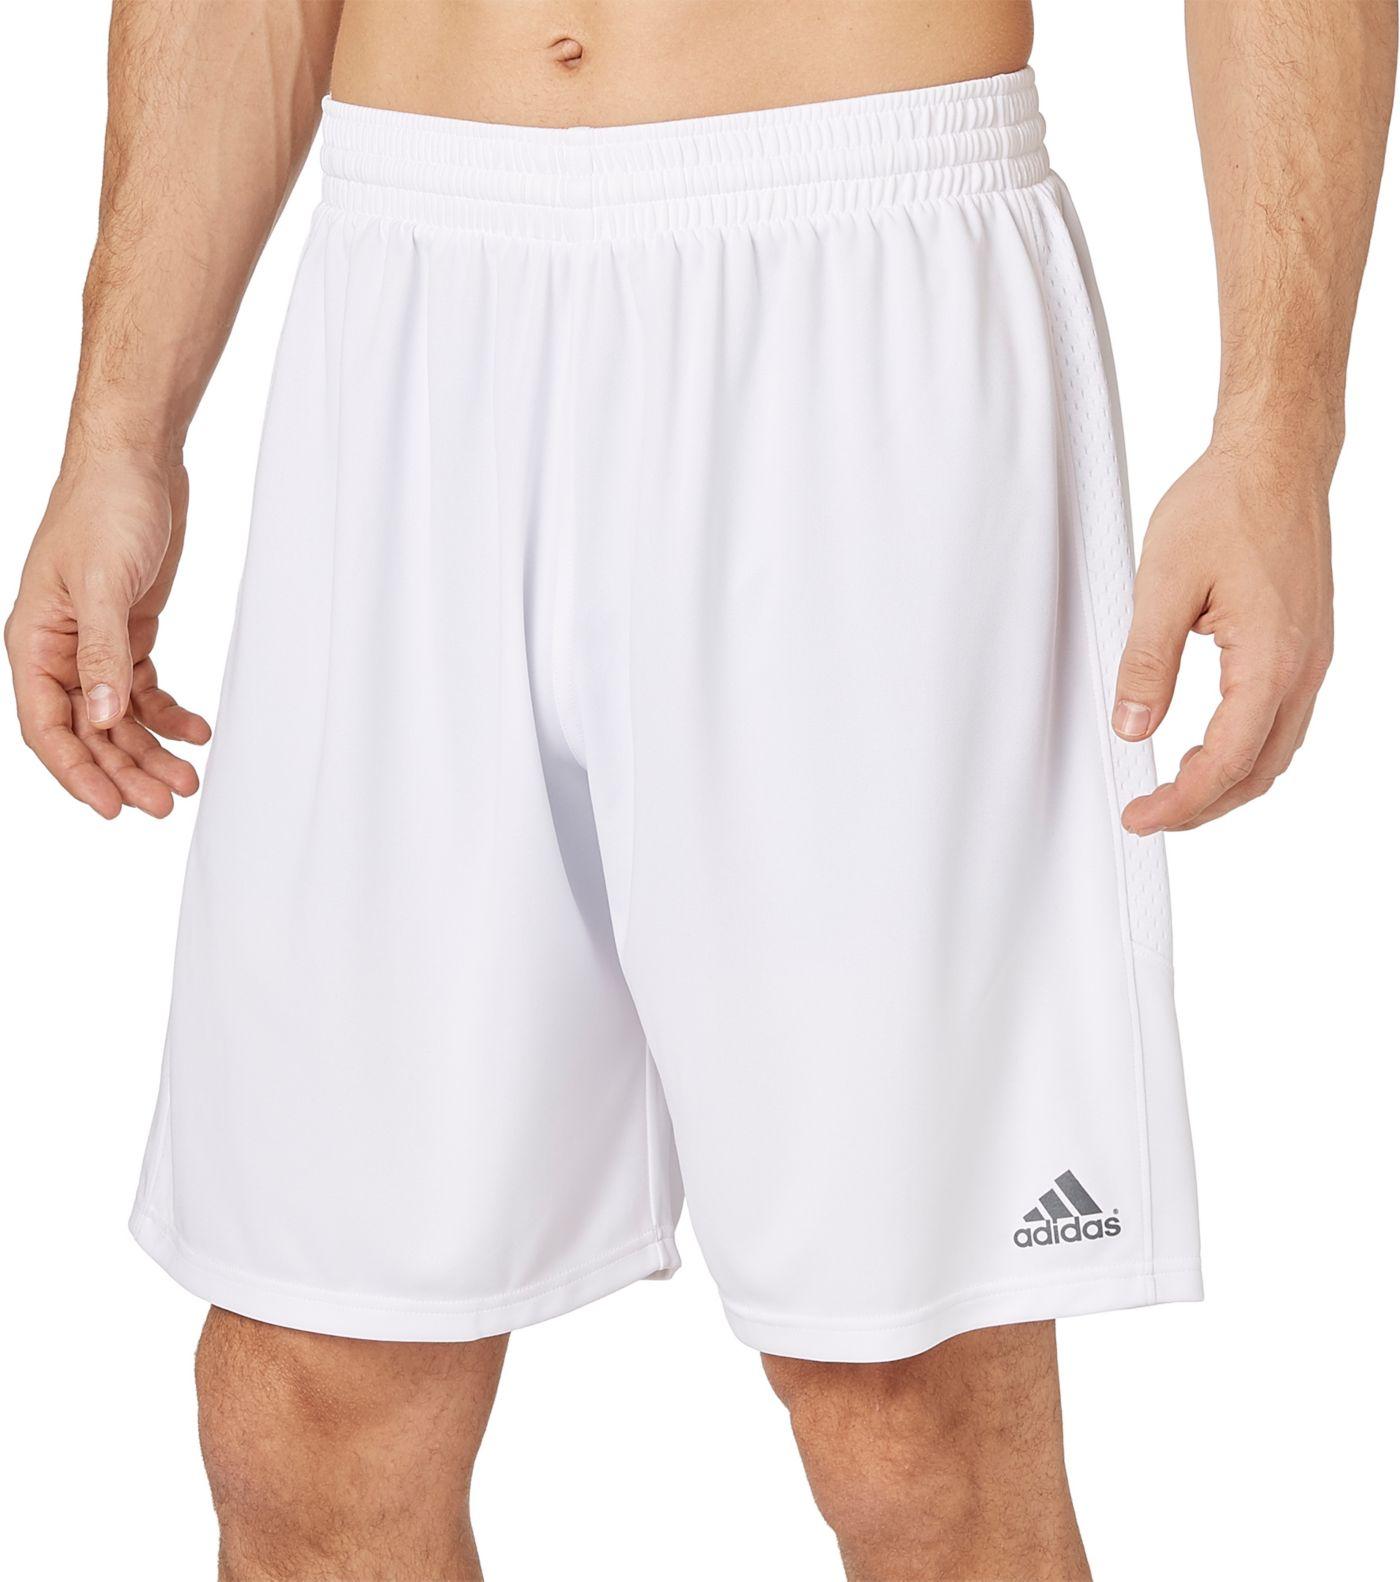 adidas Adult Flag Football Shorts